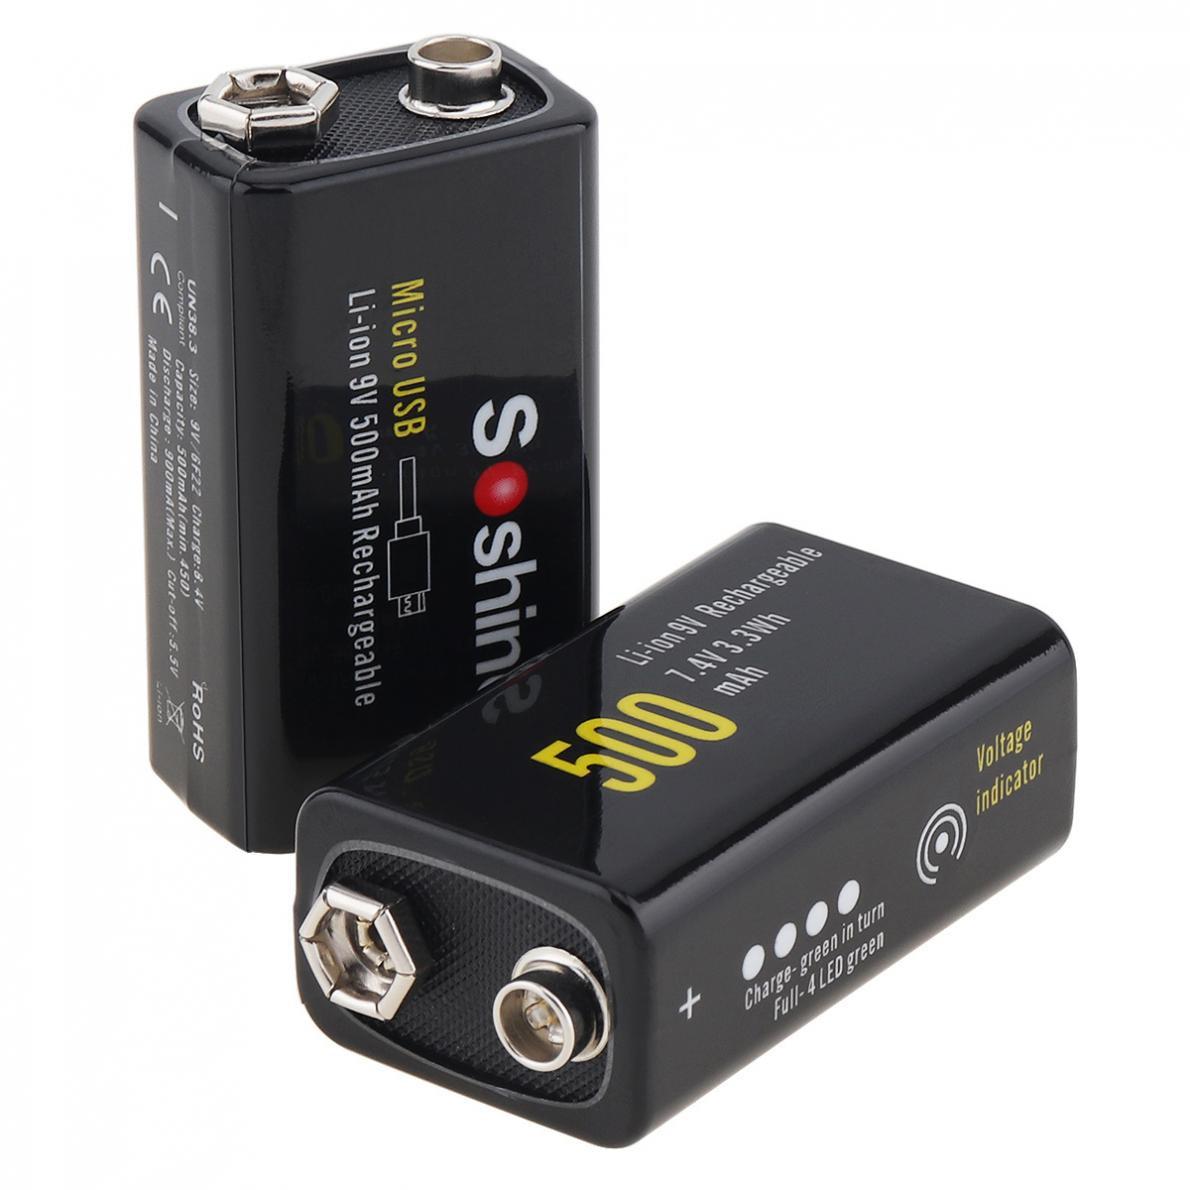 Soshine 2 uds 9V 6F22 500Mah Li-Ion 7,4 V 3.3Wh batería recargable micro-usb protegido para micrófono inalámbrico multímetro Alar